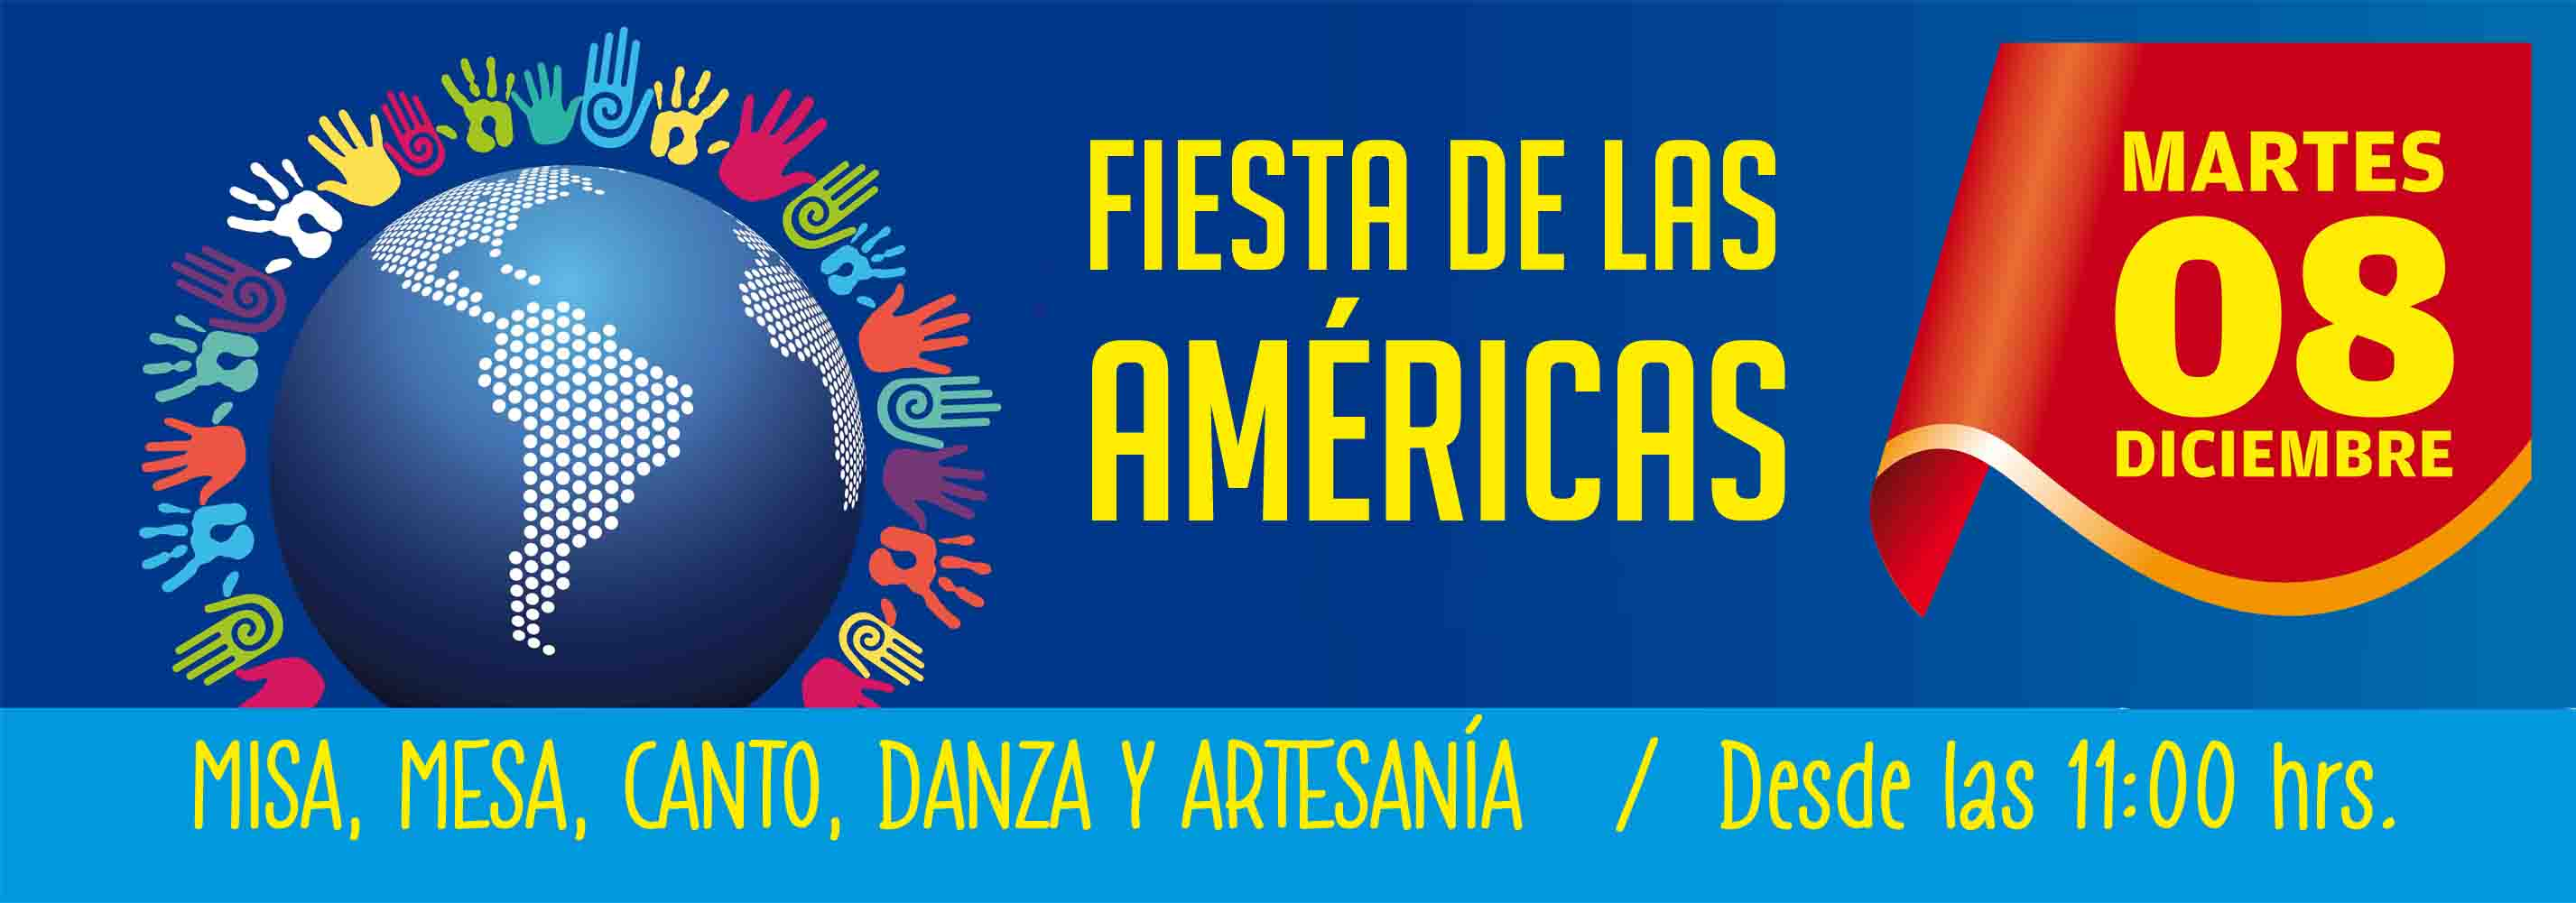 Banner-Fiesta-Americas-2015